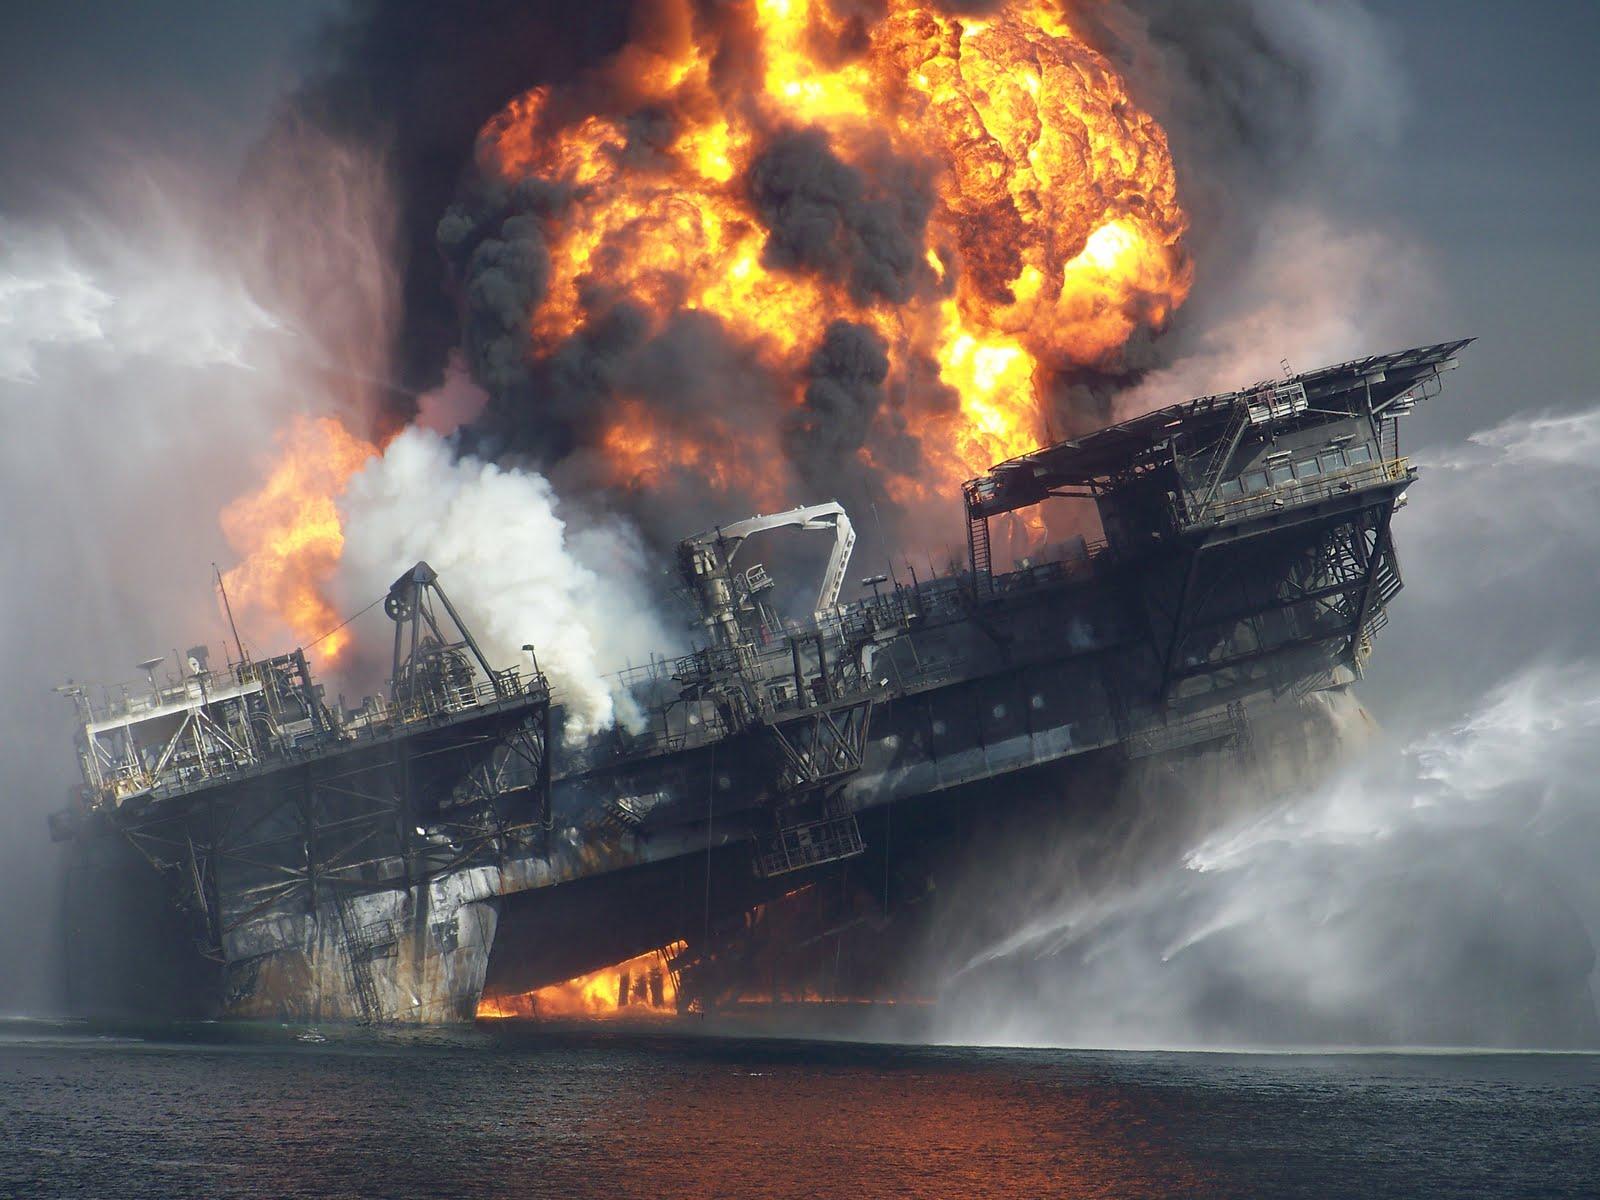 oil-industry-mishaps-1.jpg